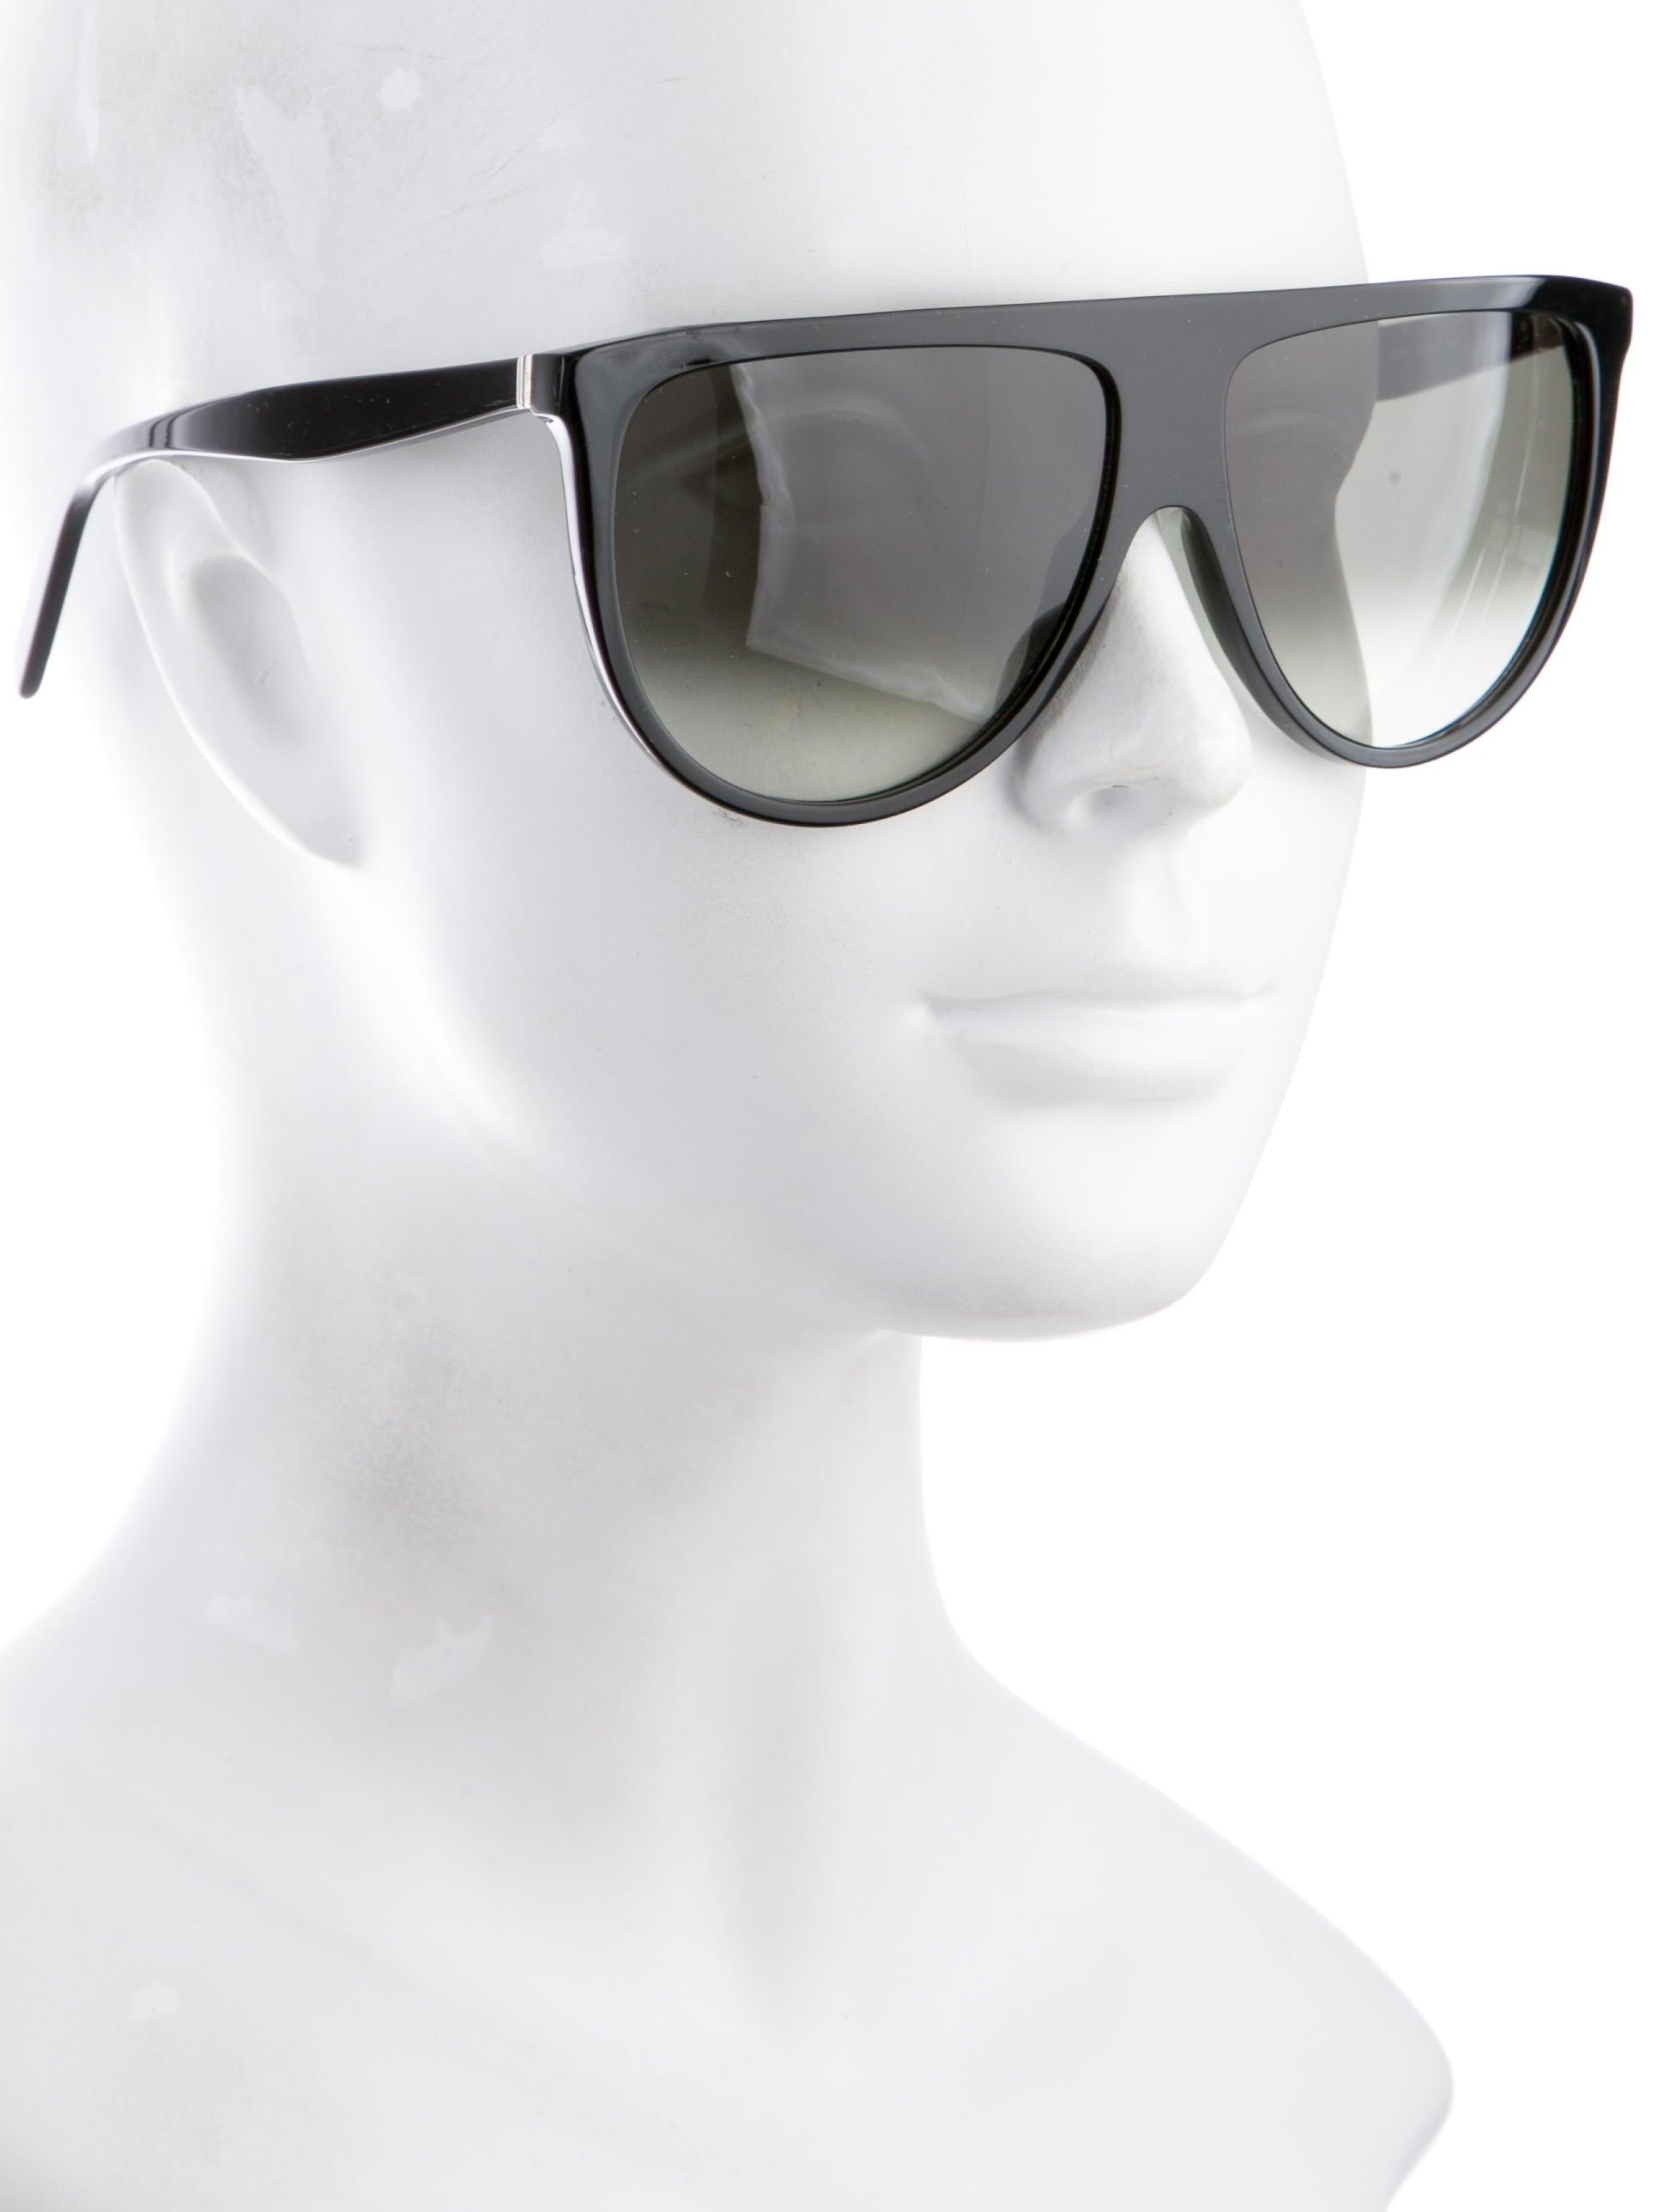 b529381bac4c Celine Thin Shadow Sunglasses - Bitterroot Public Library